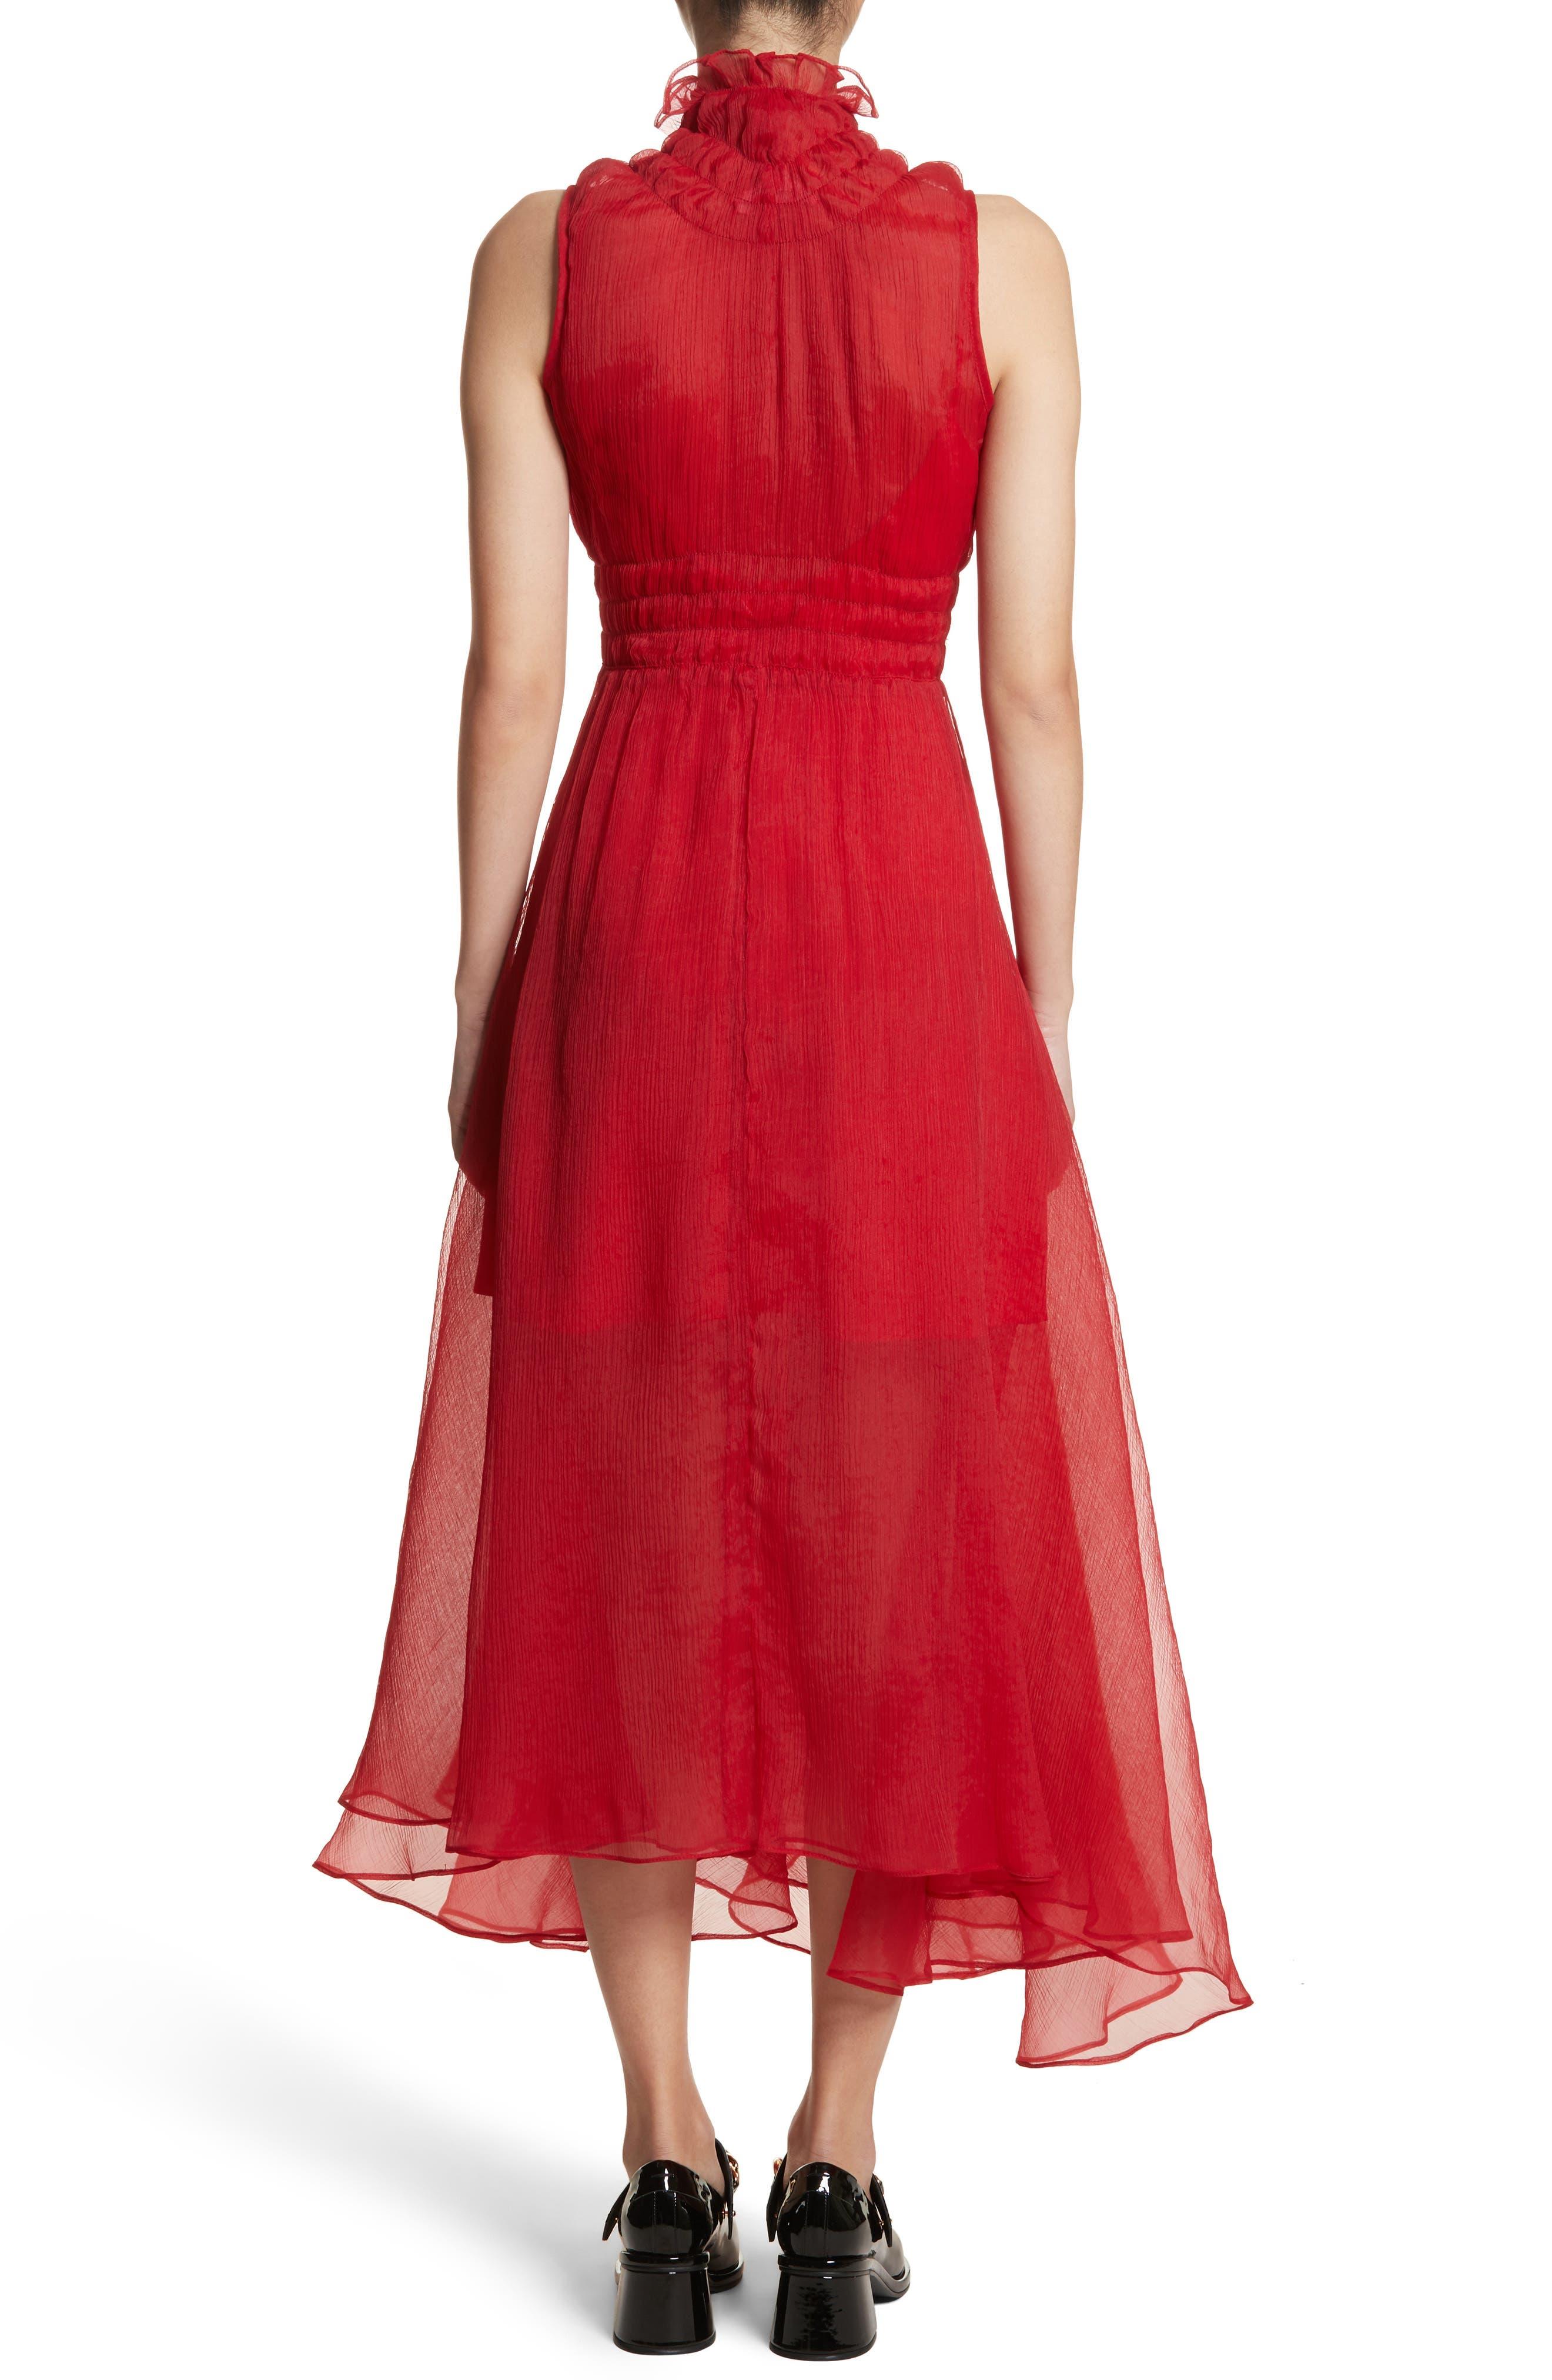 Venus Chiffon Dress,                             Alternate thumbnail 2, color,                             Red